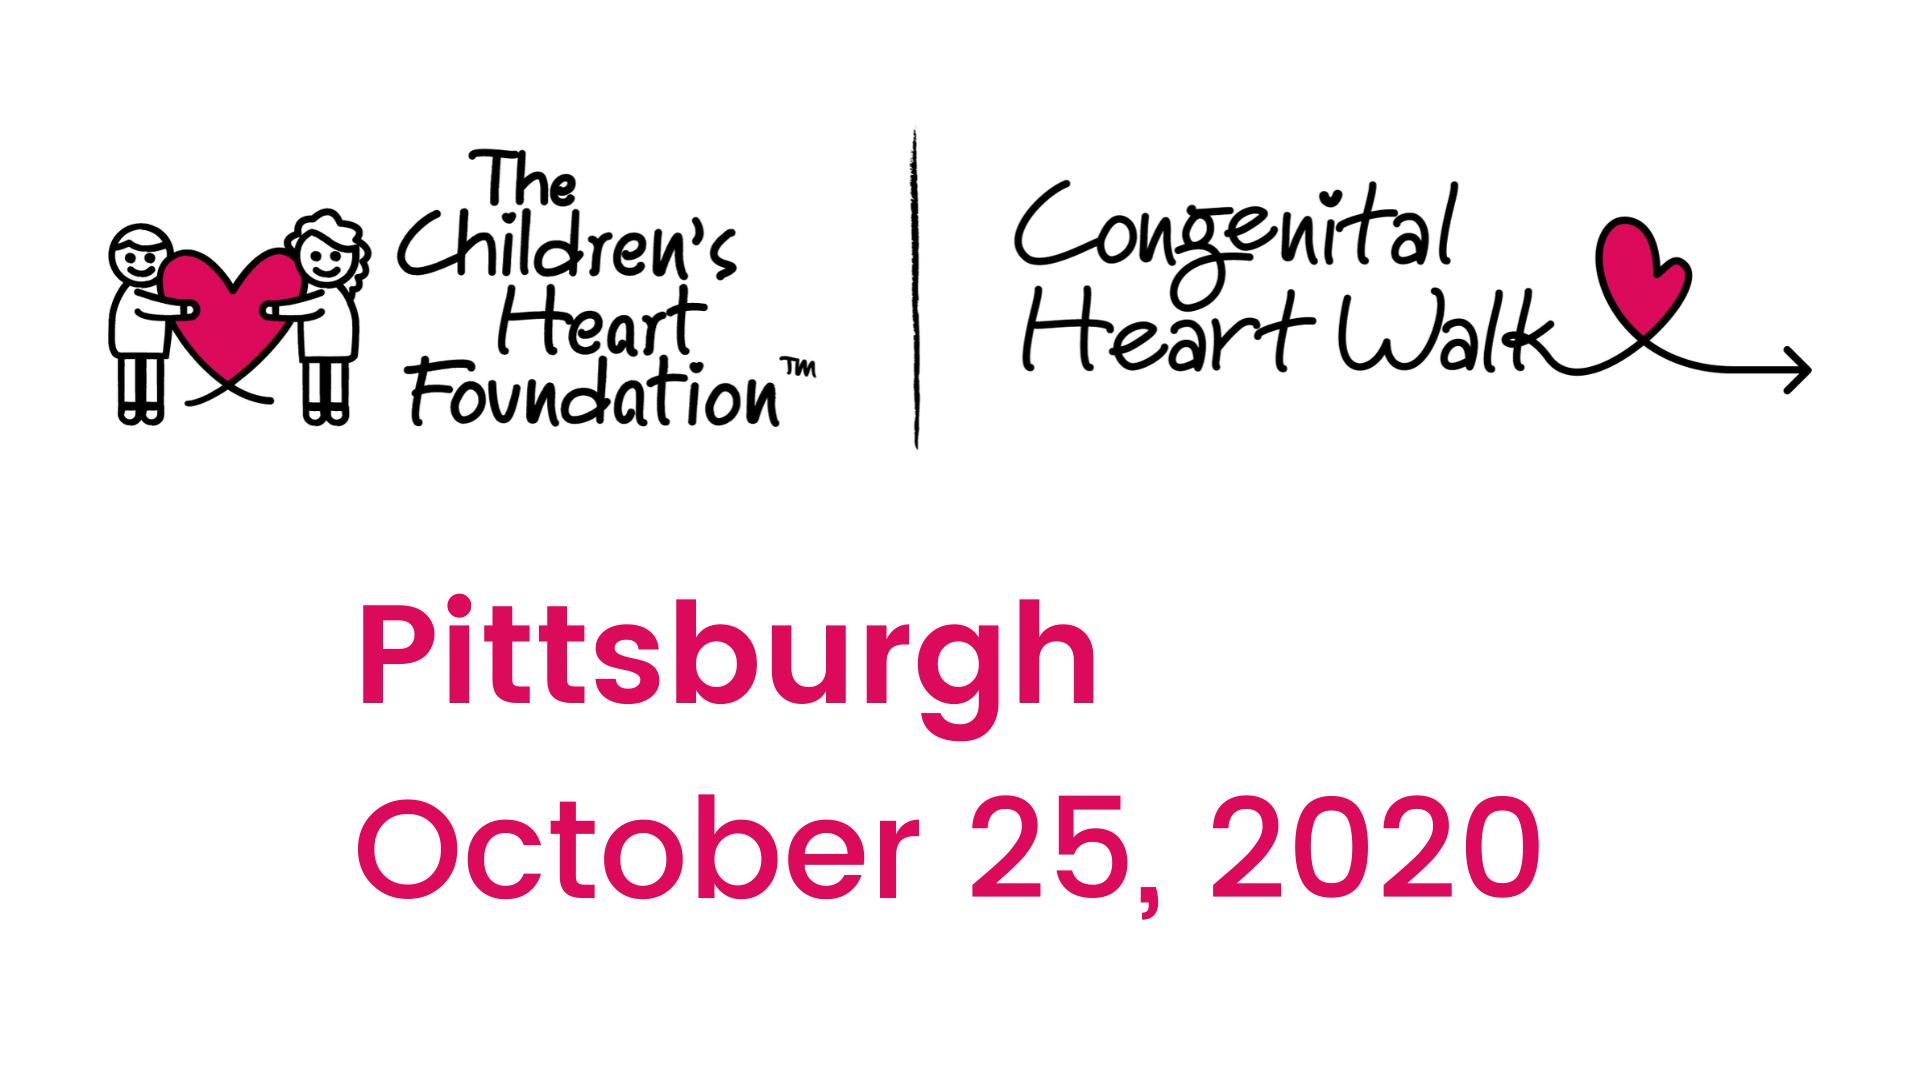 Pittsburgh Congenital Heart Walk